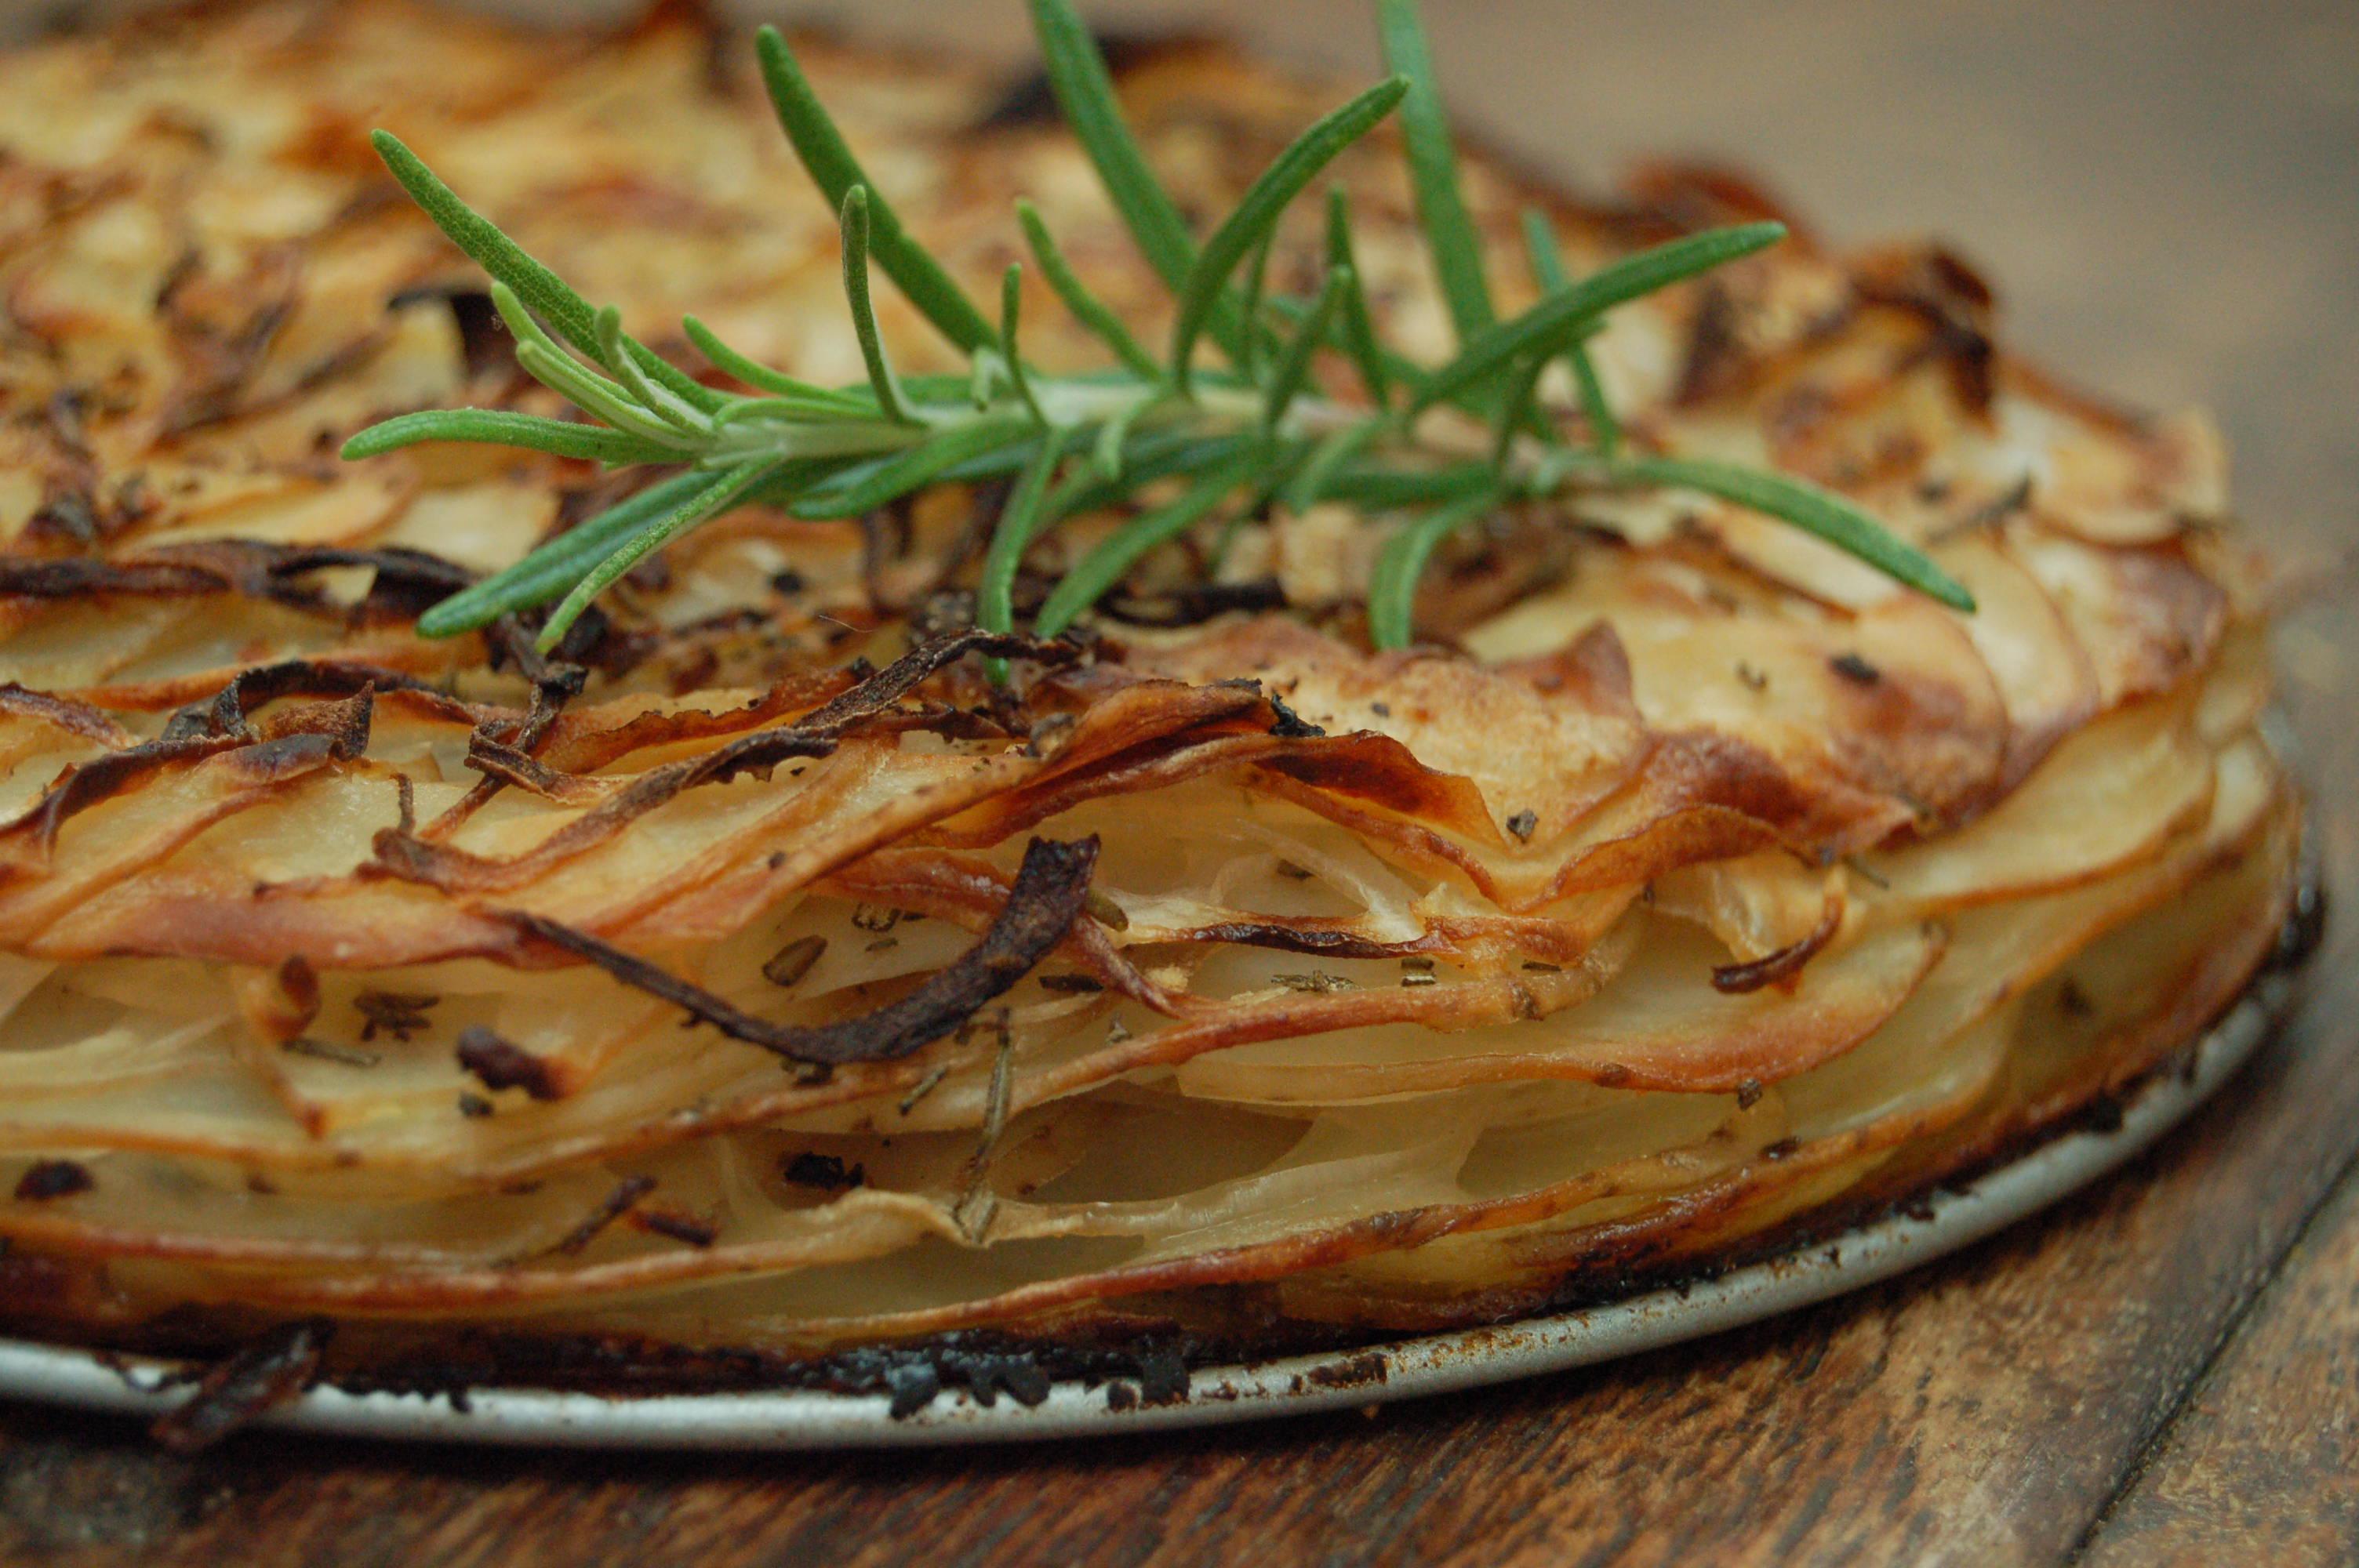 potato, rosemary and onion layer bake